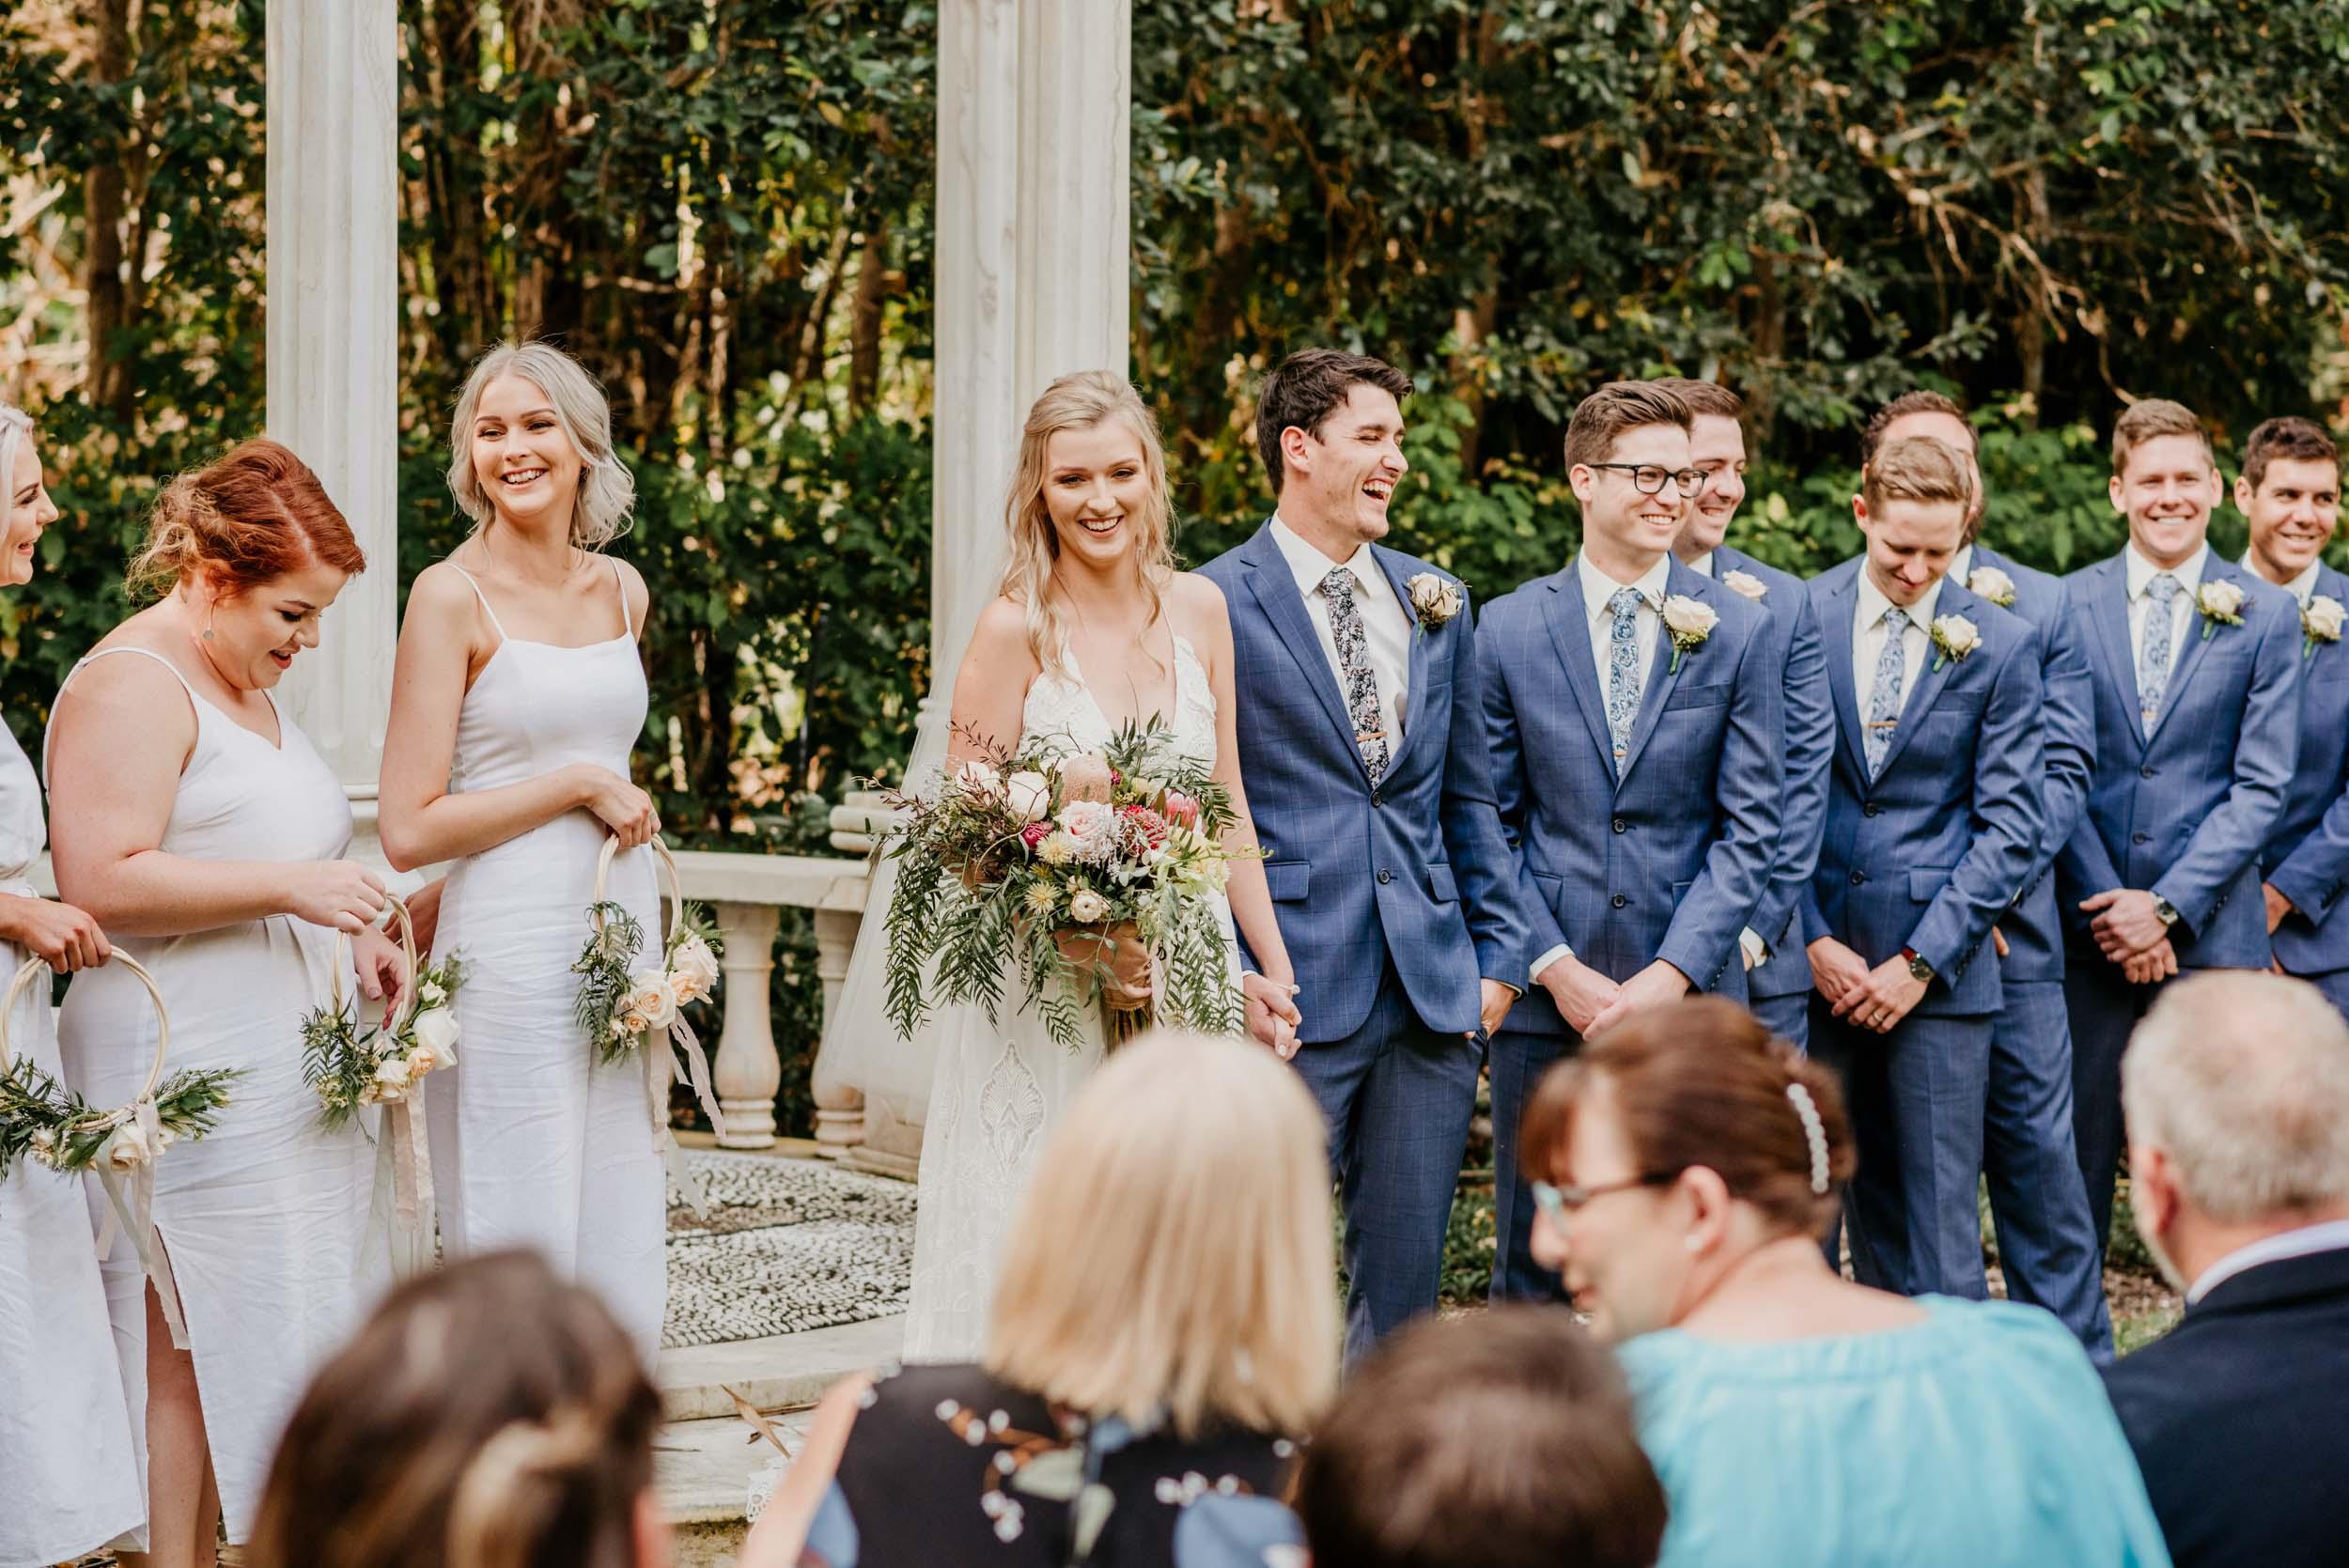 The Raw Photographer - Cairns Wedding Photographer - Laloli - Cairns Garden Wedding - Wedding Dress-35.jpg